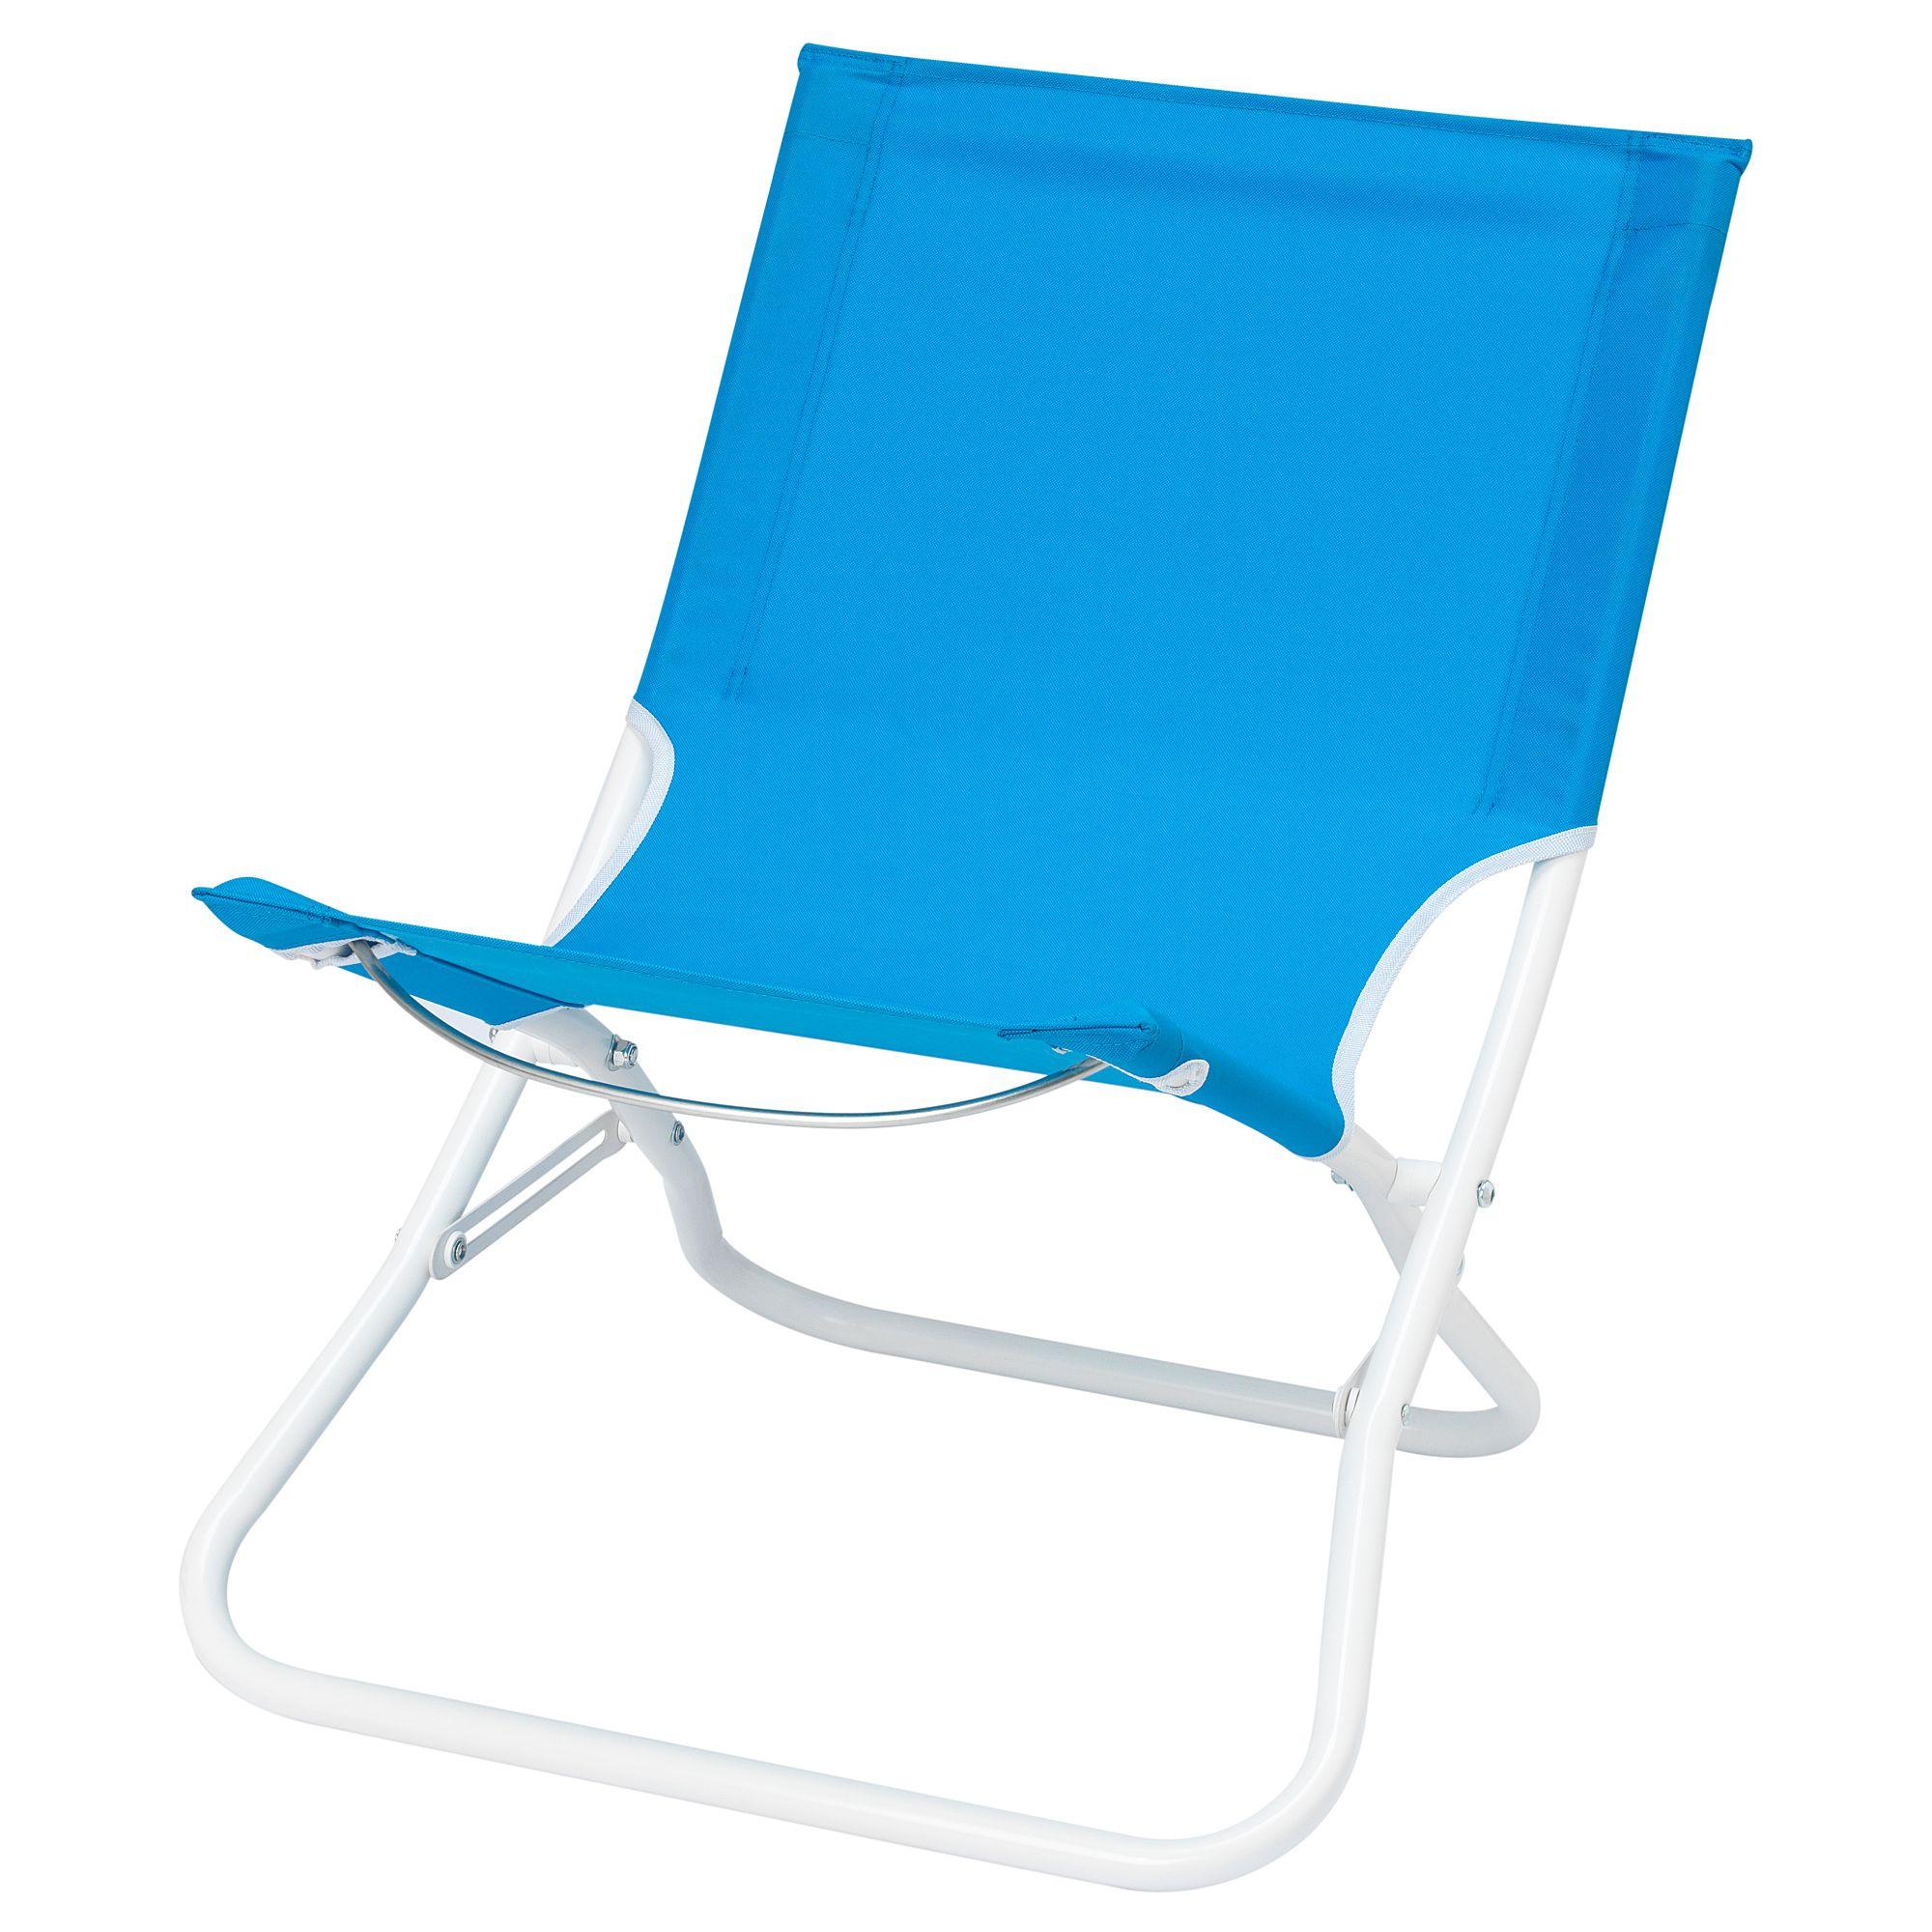 Hamo Strandstuhl Blau Gartenstuhle